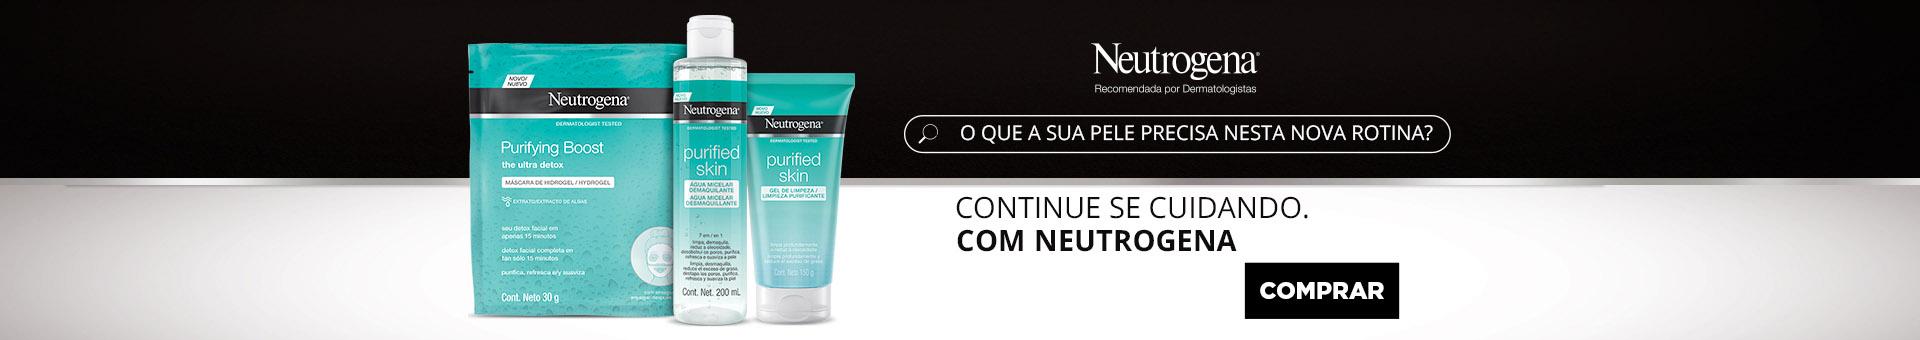 Banner Neutrogena